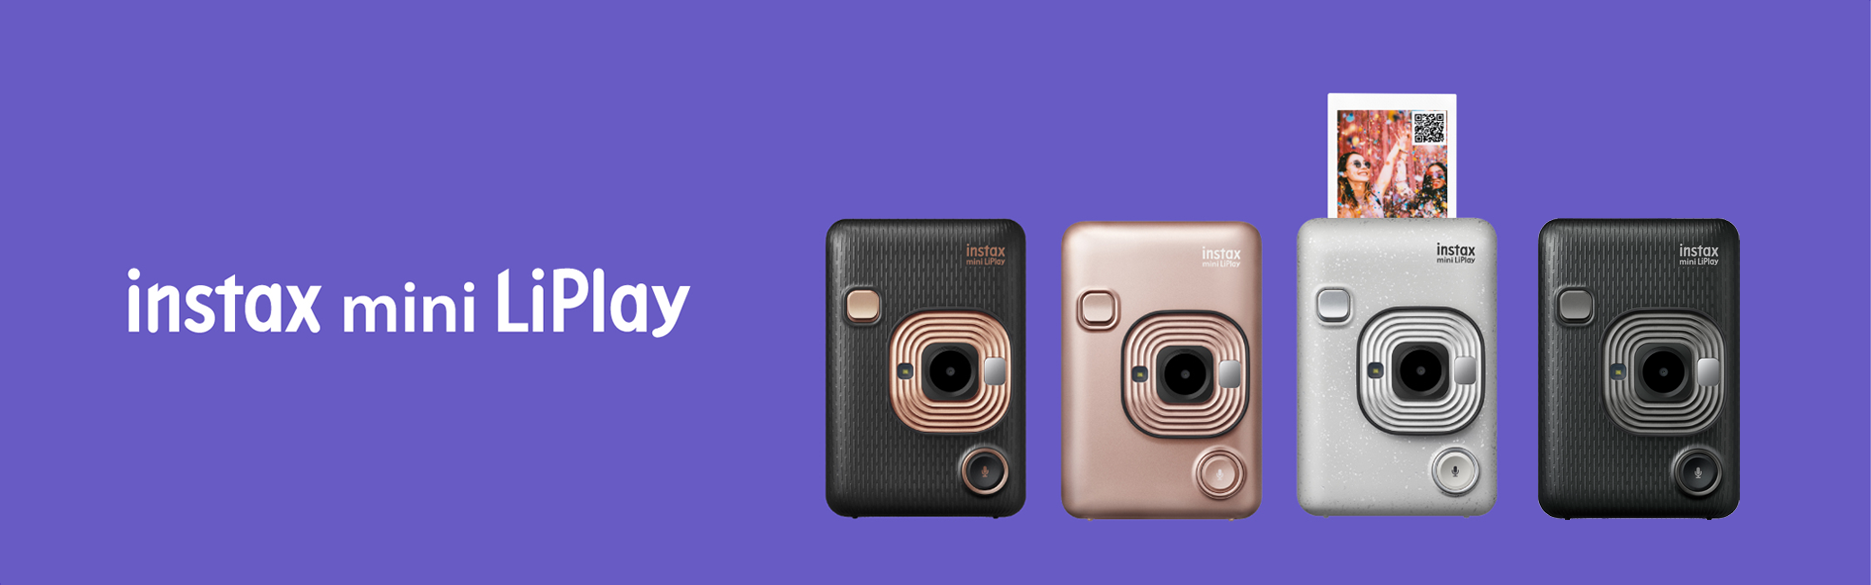 [photo] 4 Instax Mini LiPlay in Elegant Black, Blush Gold, Stone White, Dark Gray with a Instax mini LiPlay on a purple background